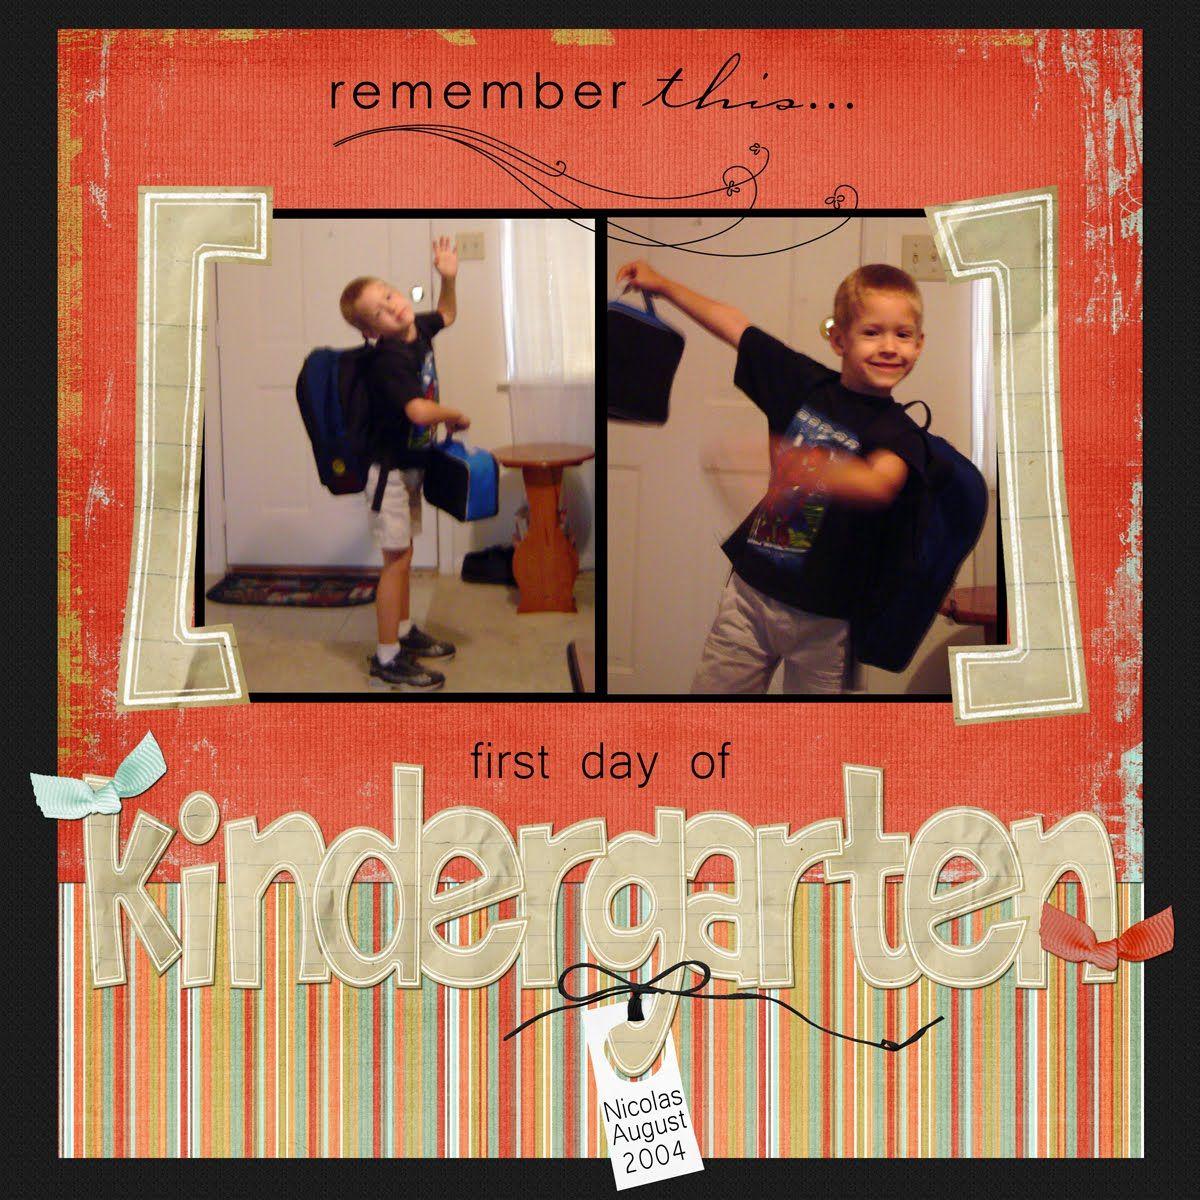 Scrapbook ideas kindergarten - First Day Of Kindergarten Grandkids Schoolfirst Dayschool Daysscrapbook Ideaskindergarten